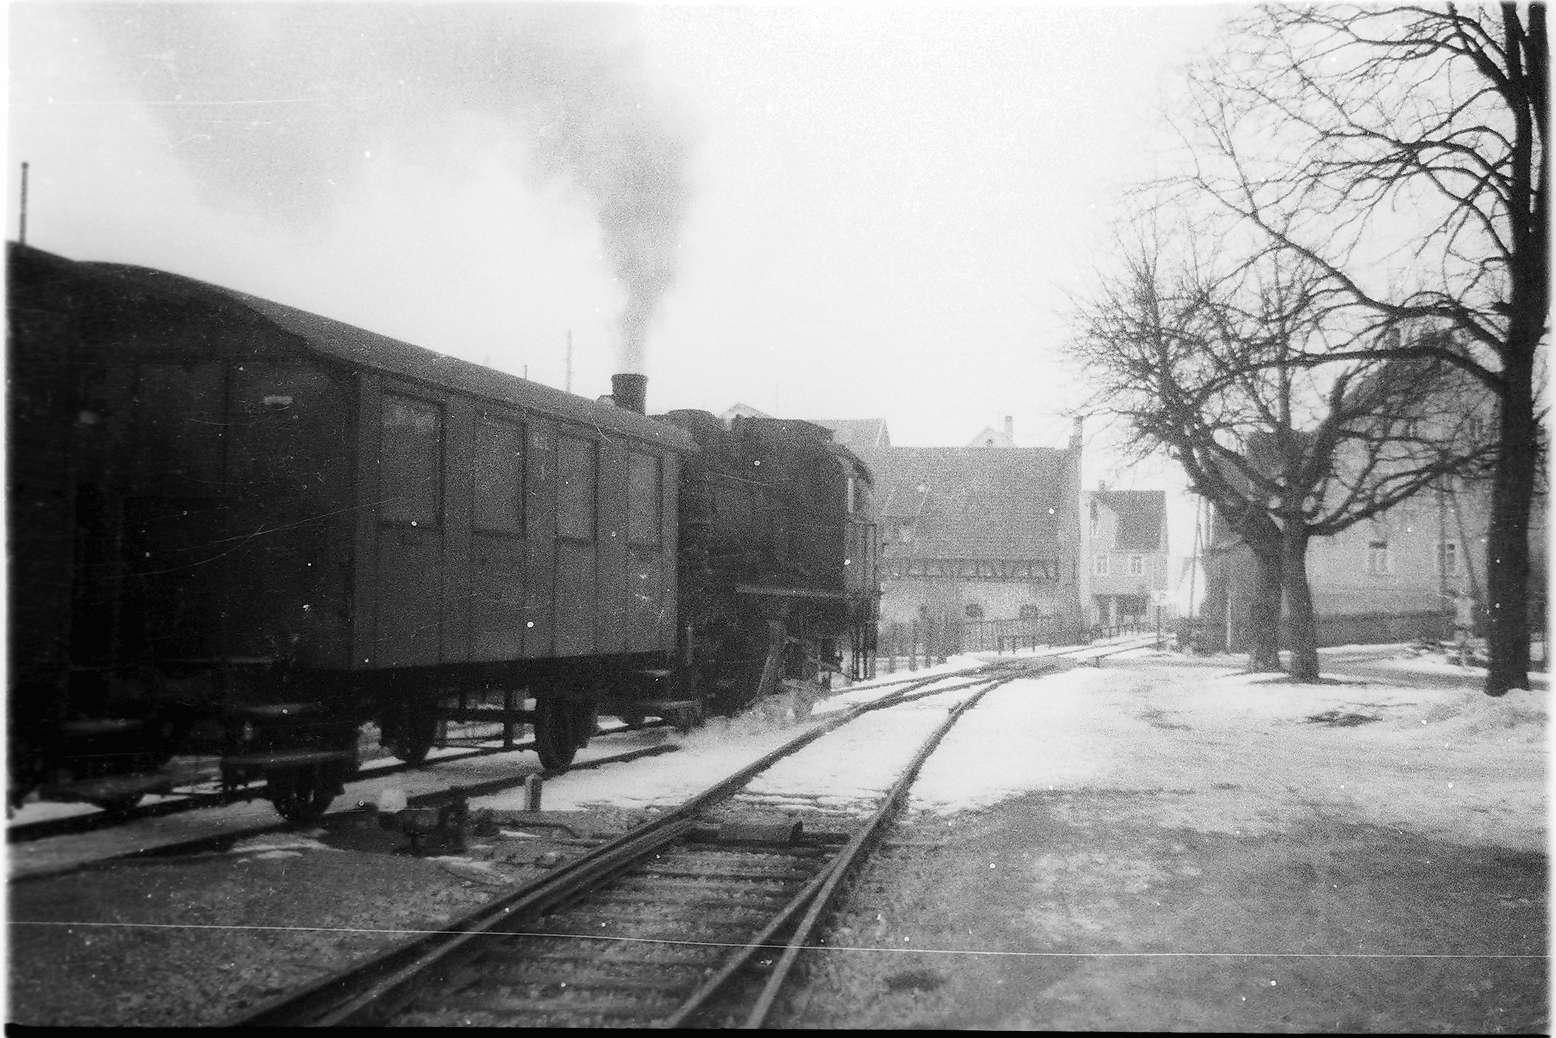 Lok 141, Trochtelfingen, Bild 1